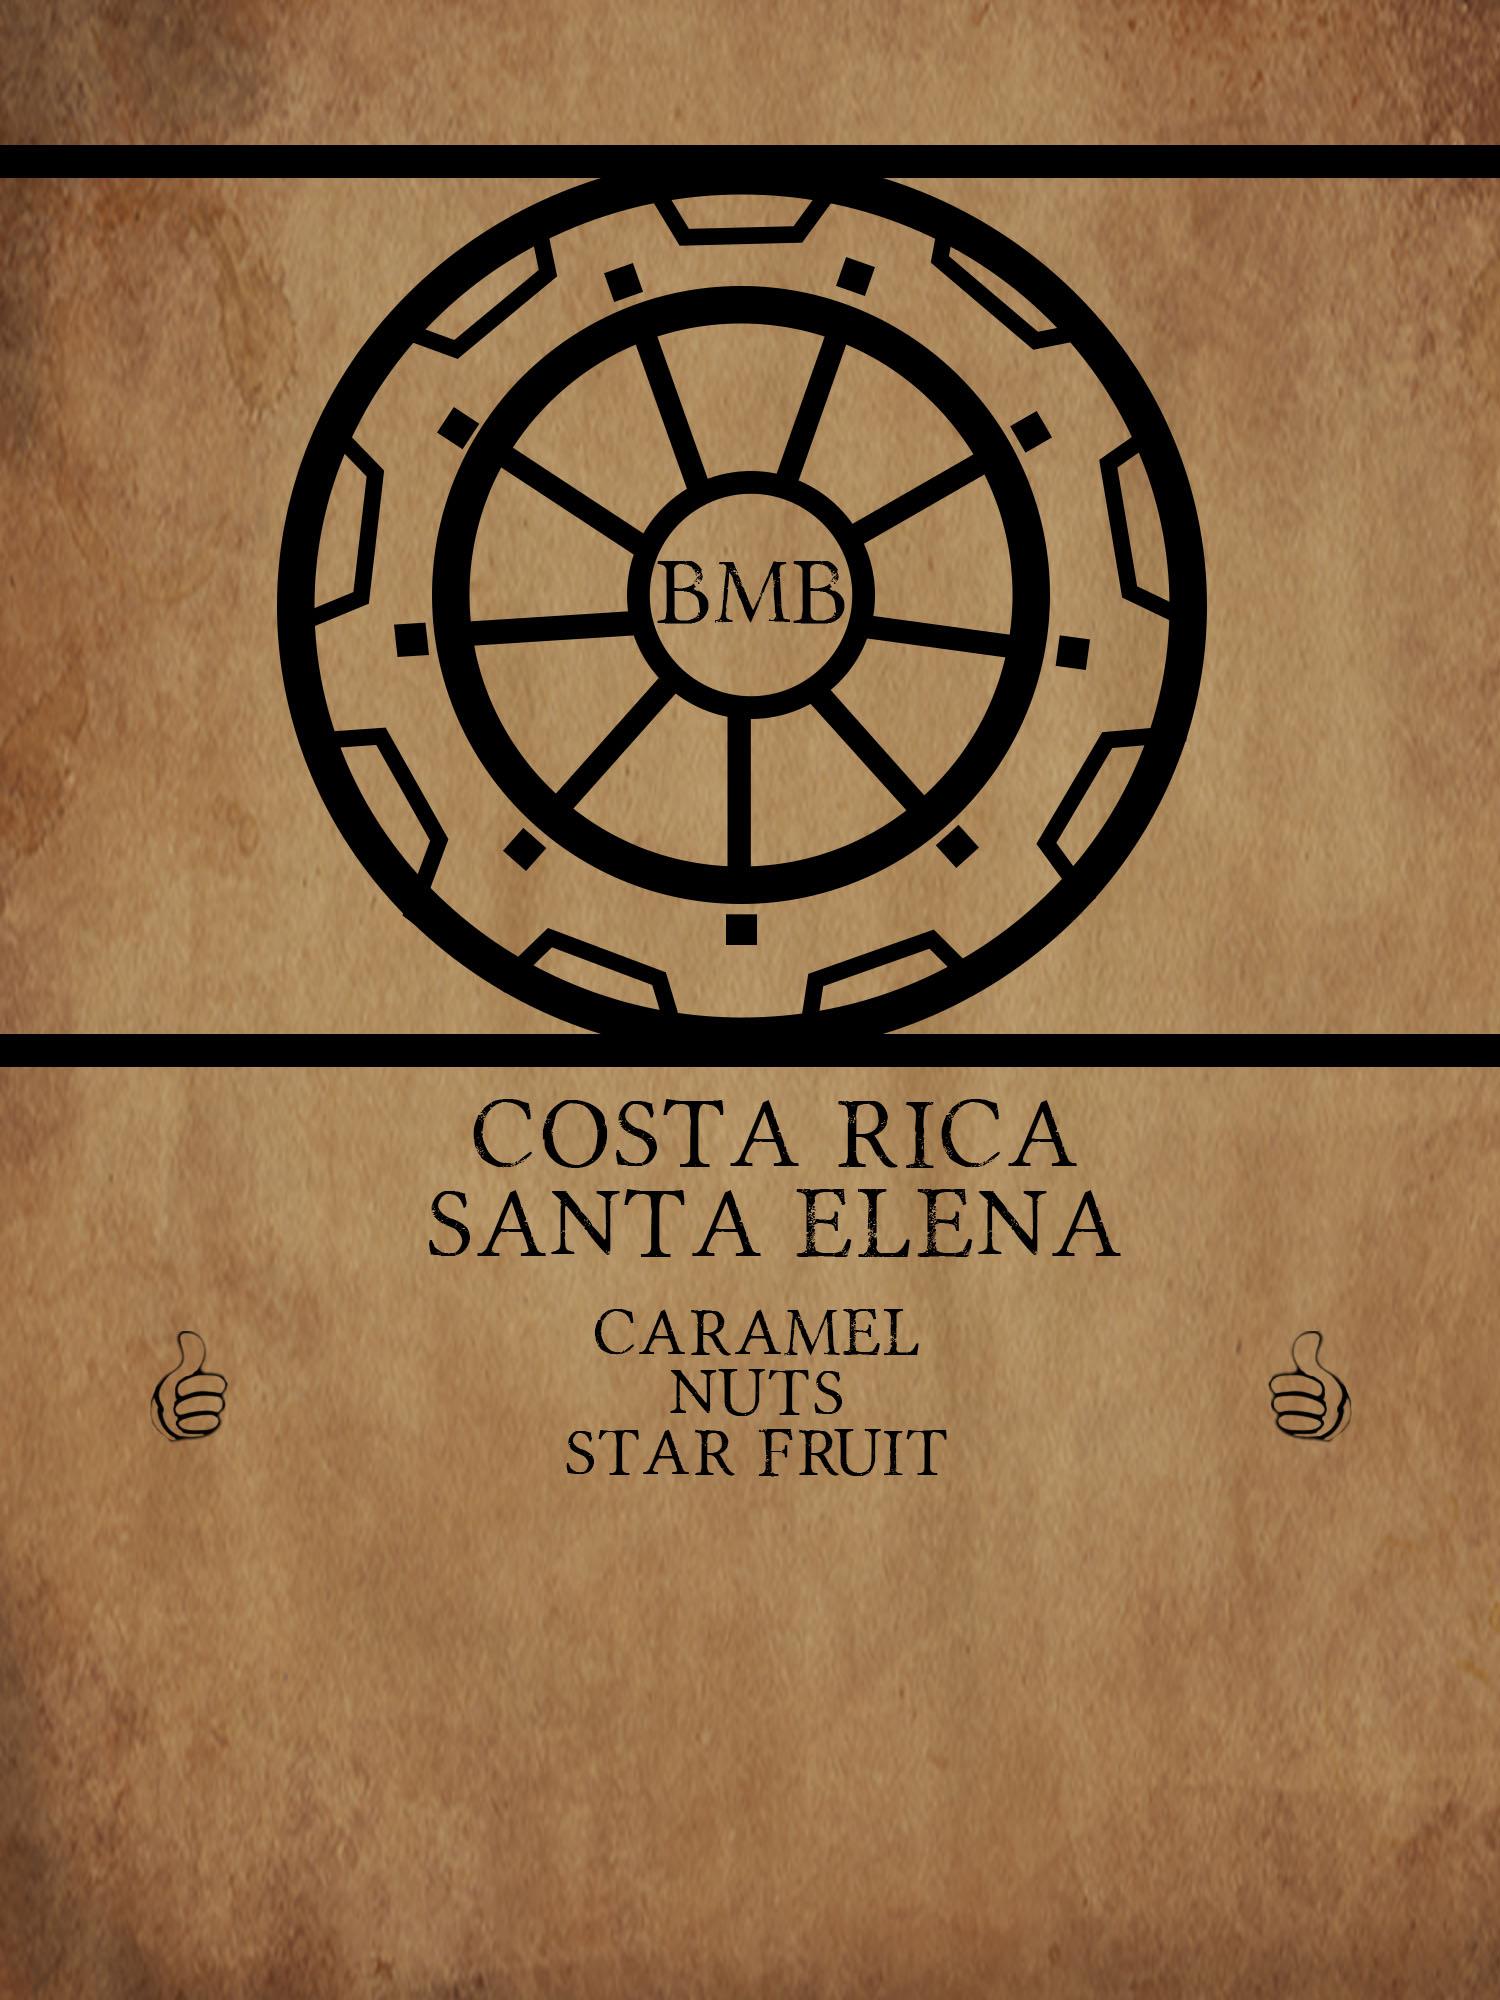 coffee_costa_rica_Santa Elena_apoclypse_gift.jpg